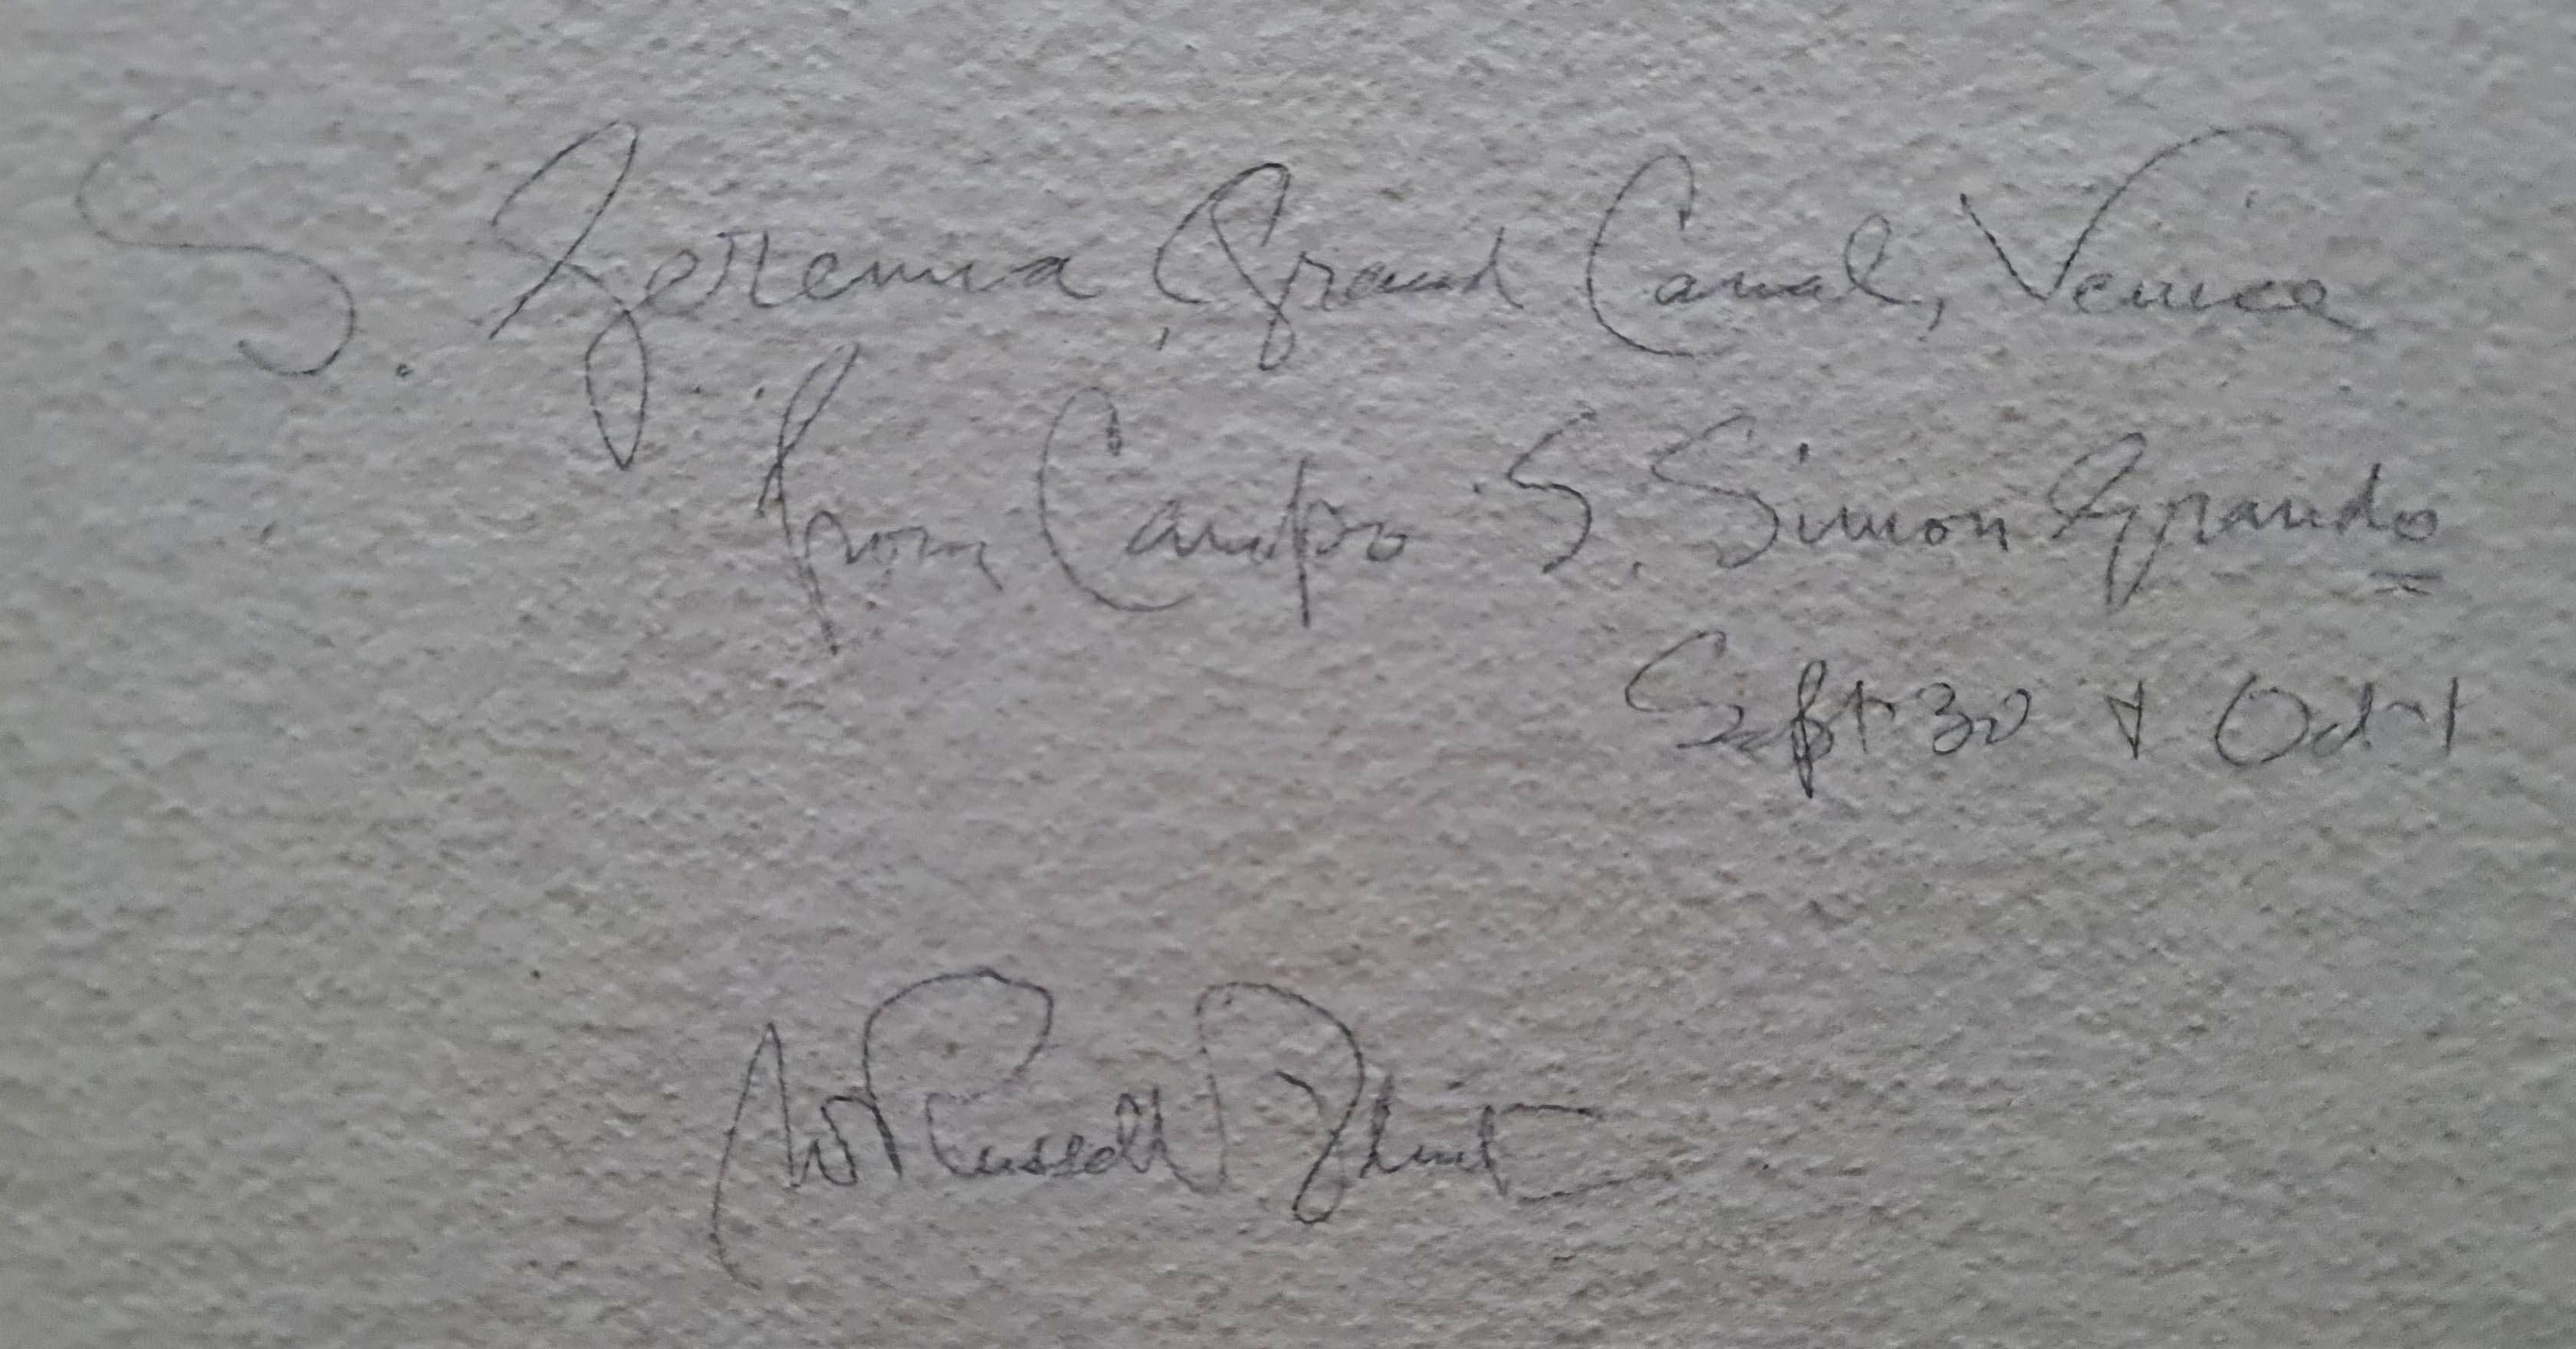 russell flint, original painting, Palazzo, San Geremia, Grand Canal, Venice, verso